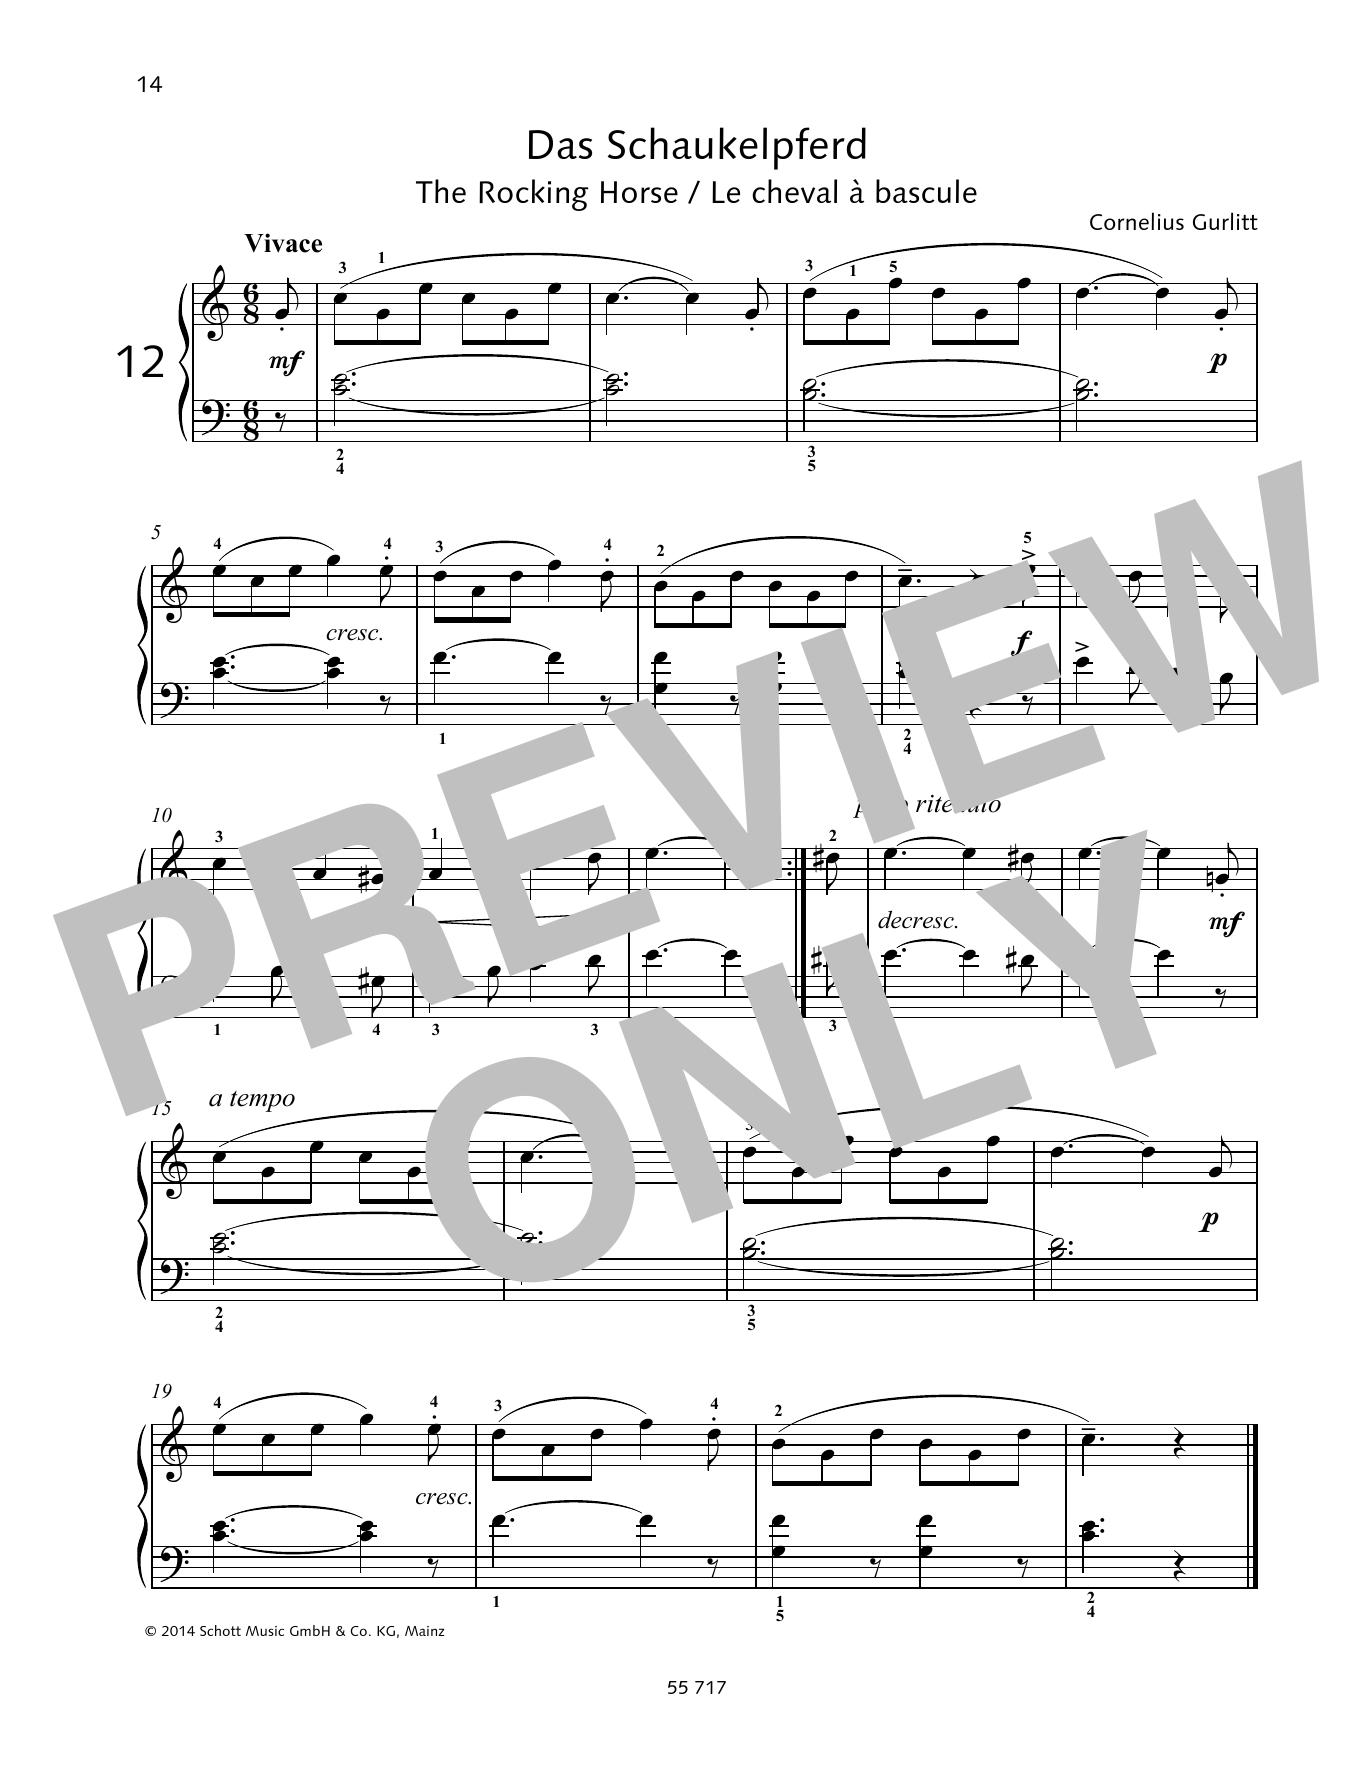 The Rocking Horse Sheet Music